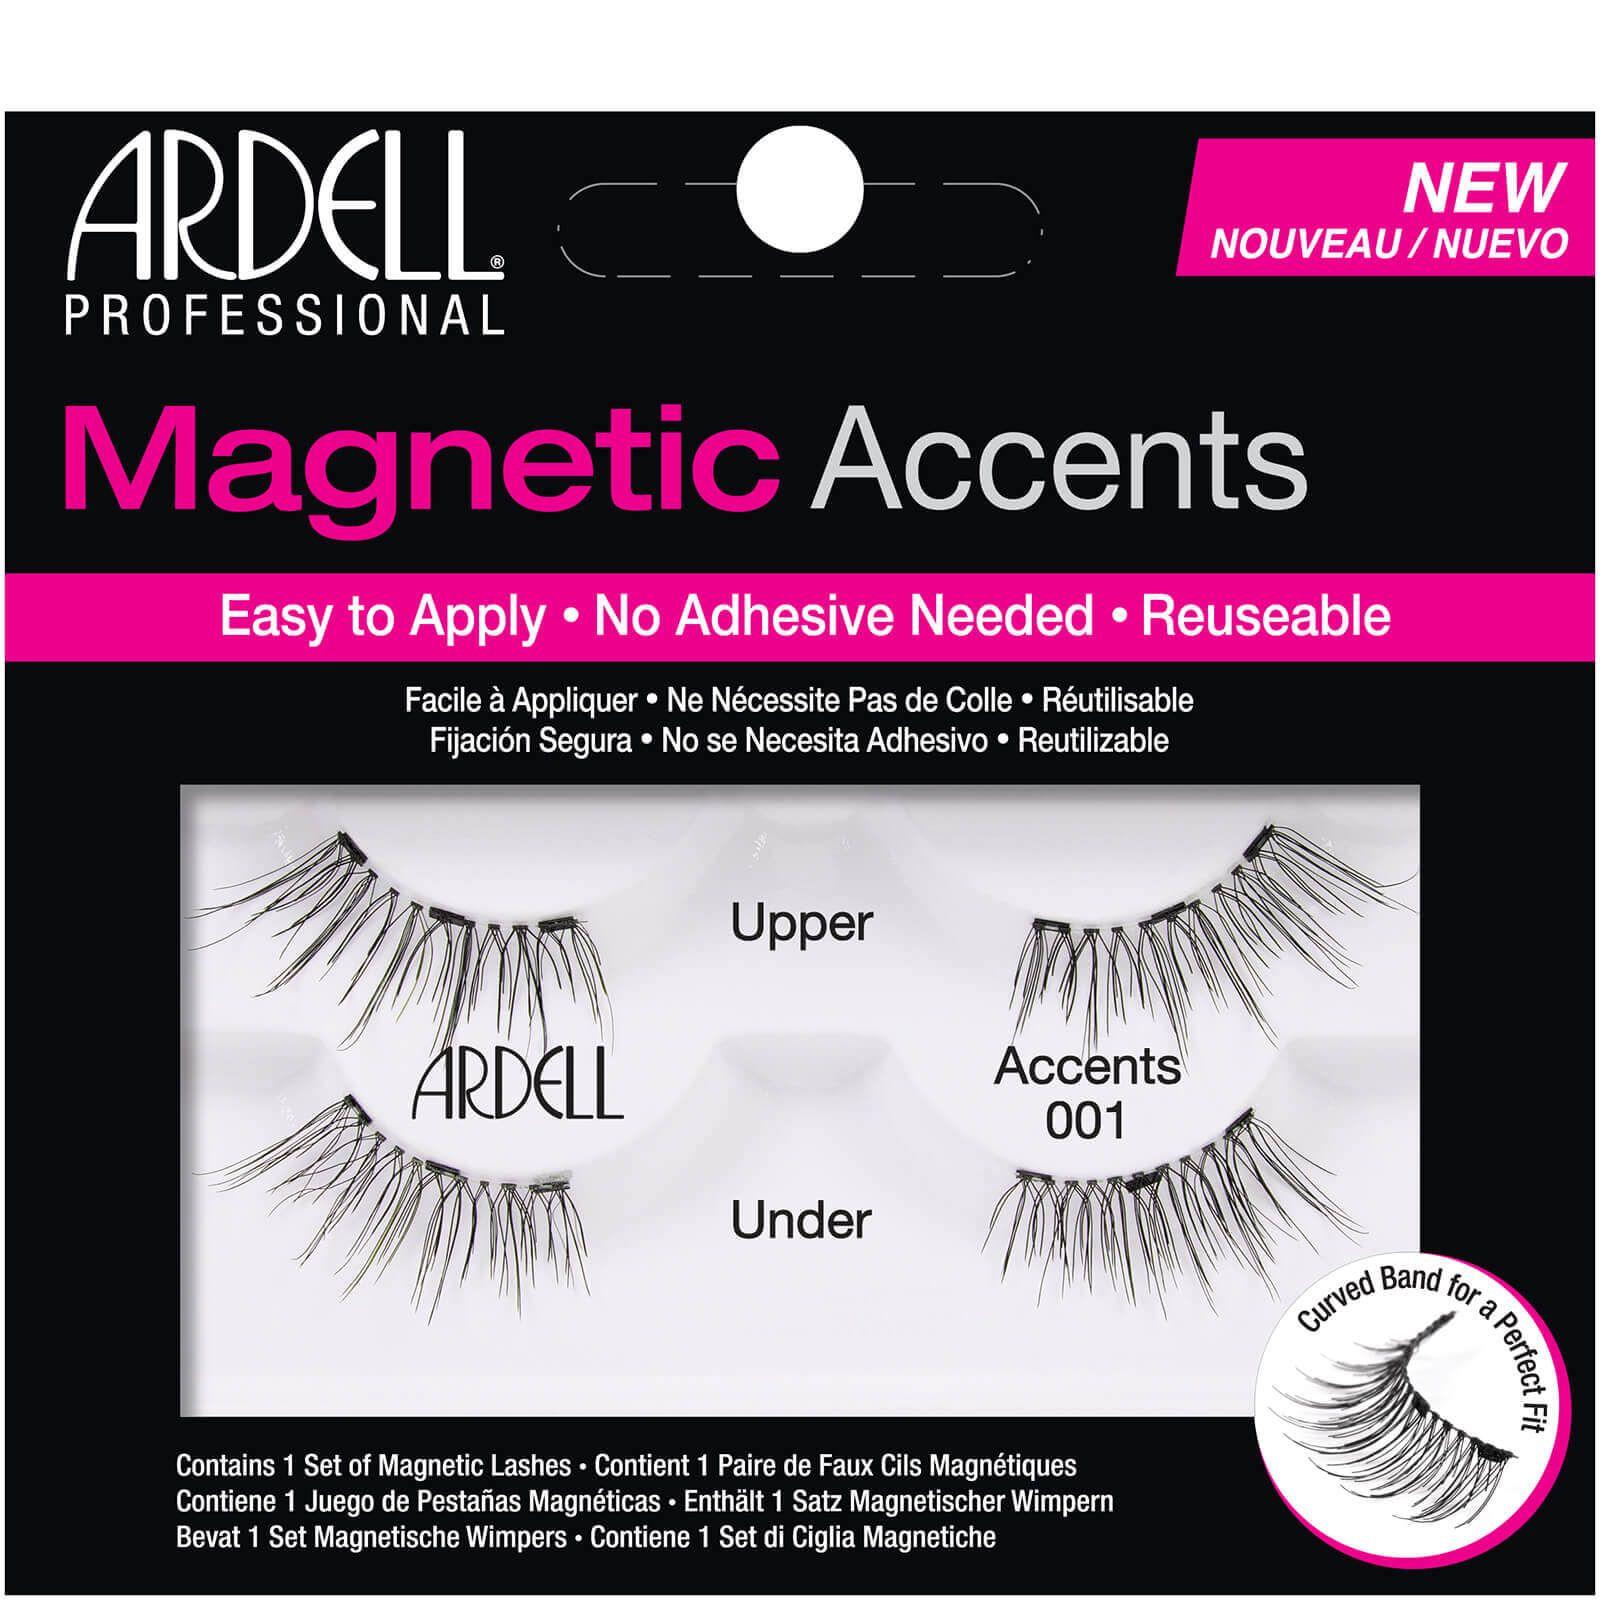 Ardell lash natural accents 001 false eyelashes